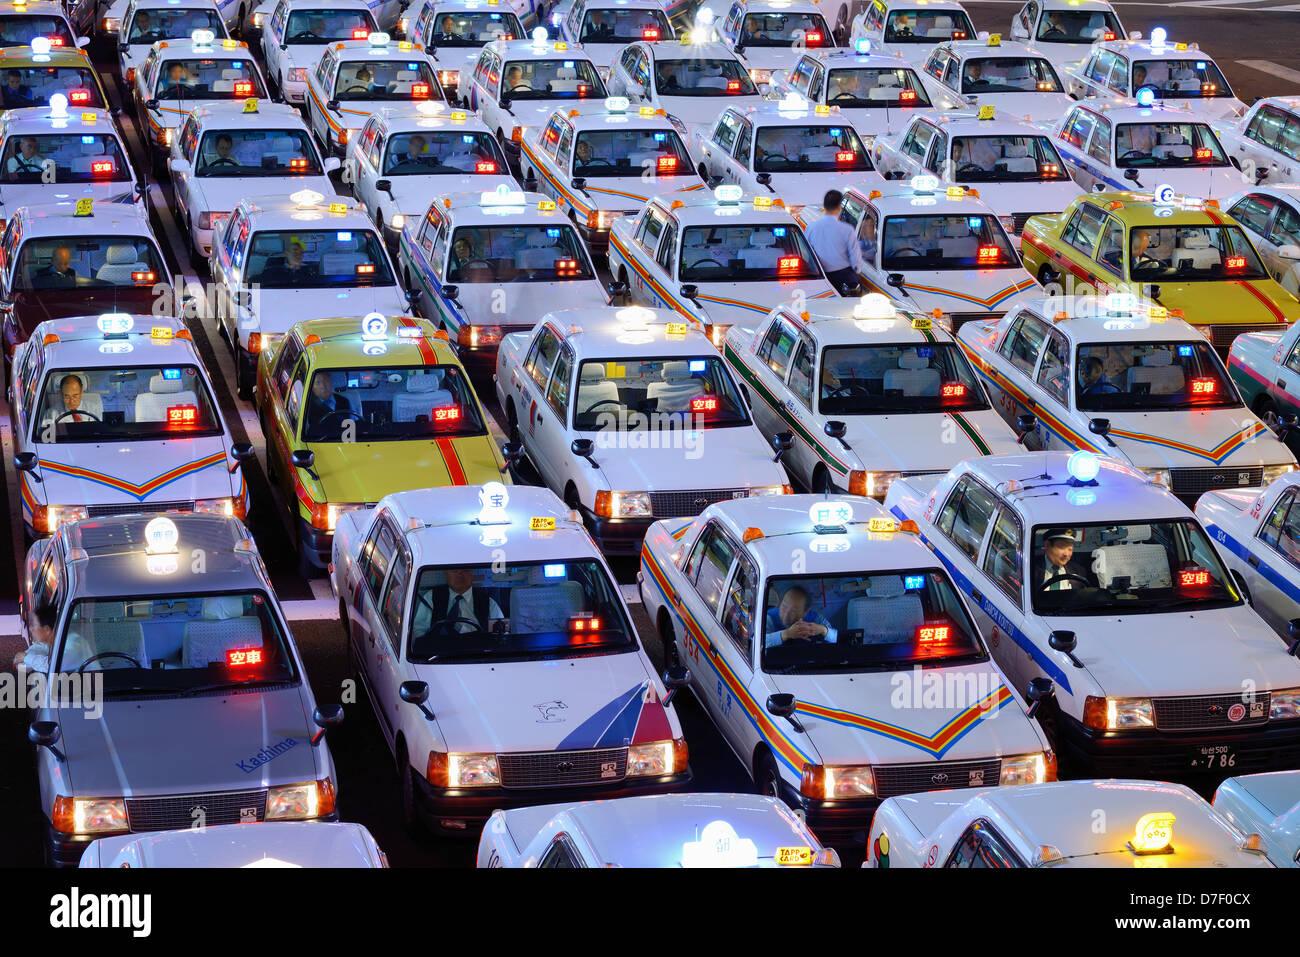 Taxis wait in Sendai, Japan - Stock Image